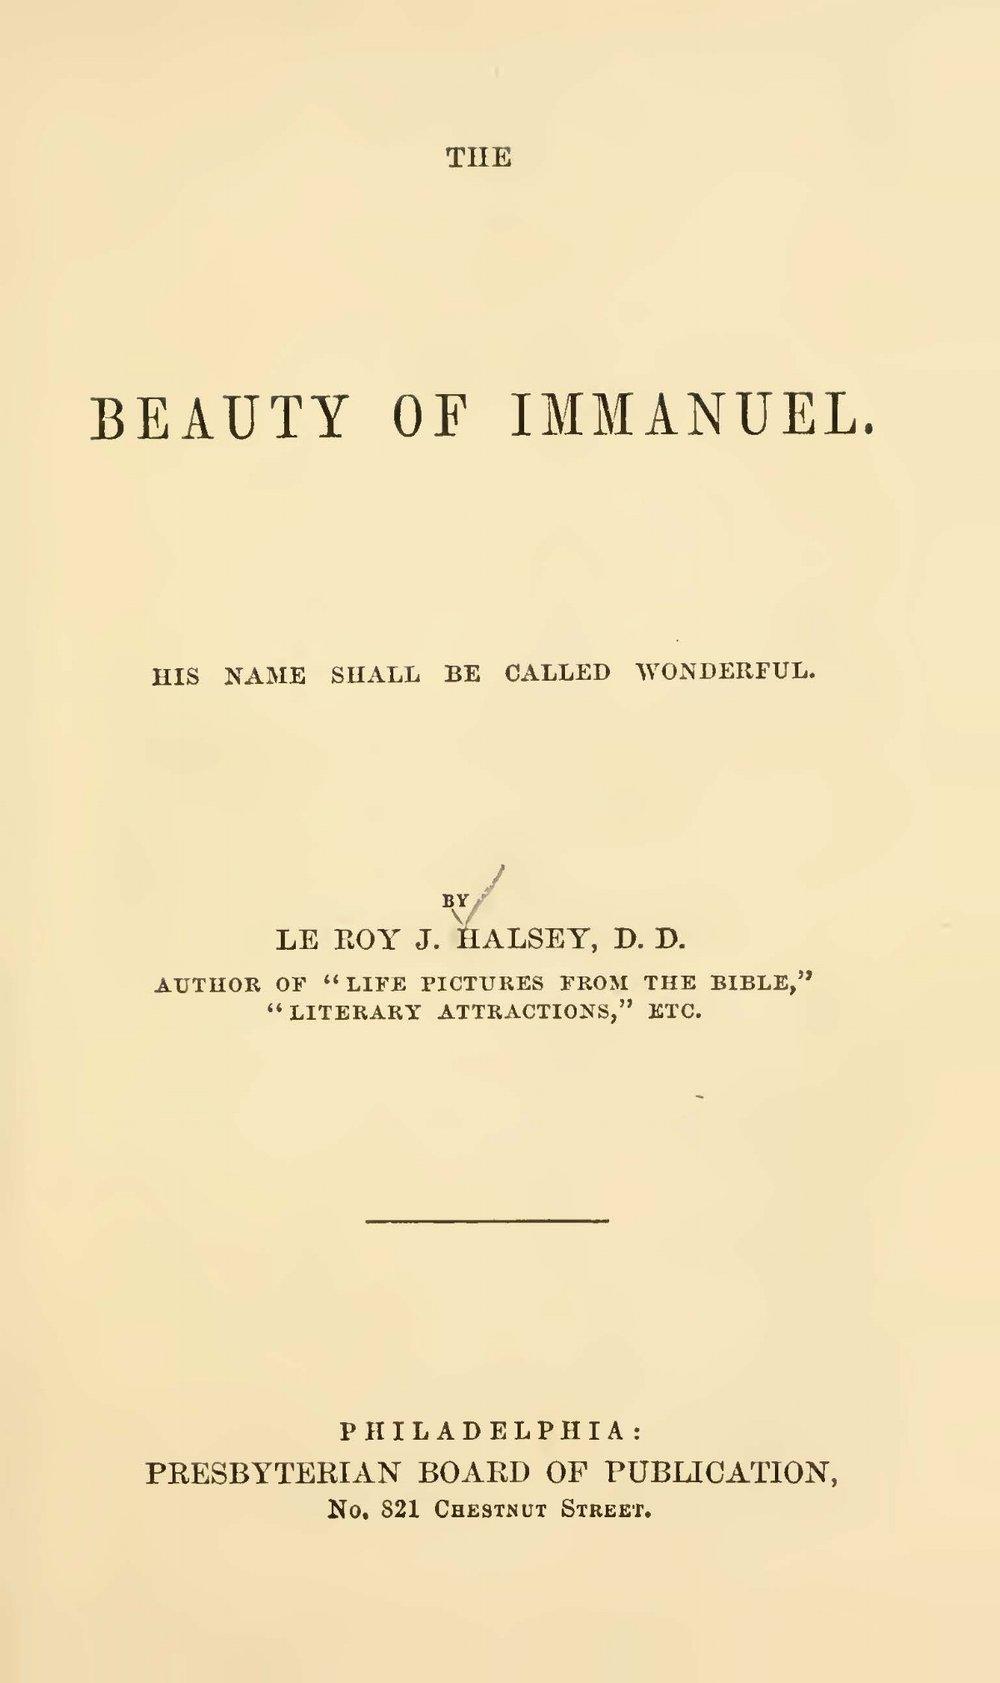 Halsey, Leroy Jones, The Beauty of Immanuel Title Page.jpg